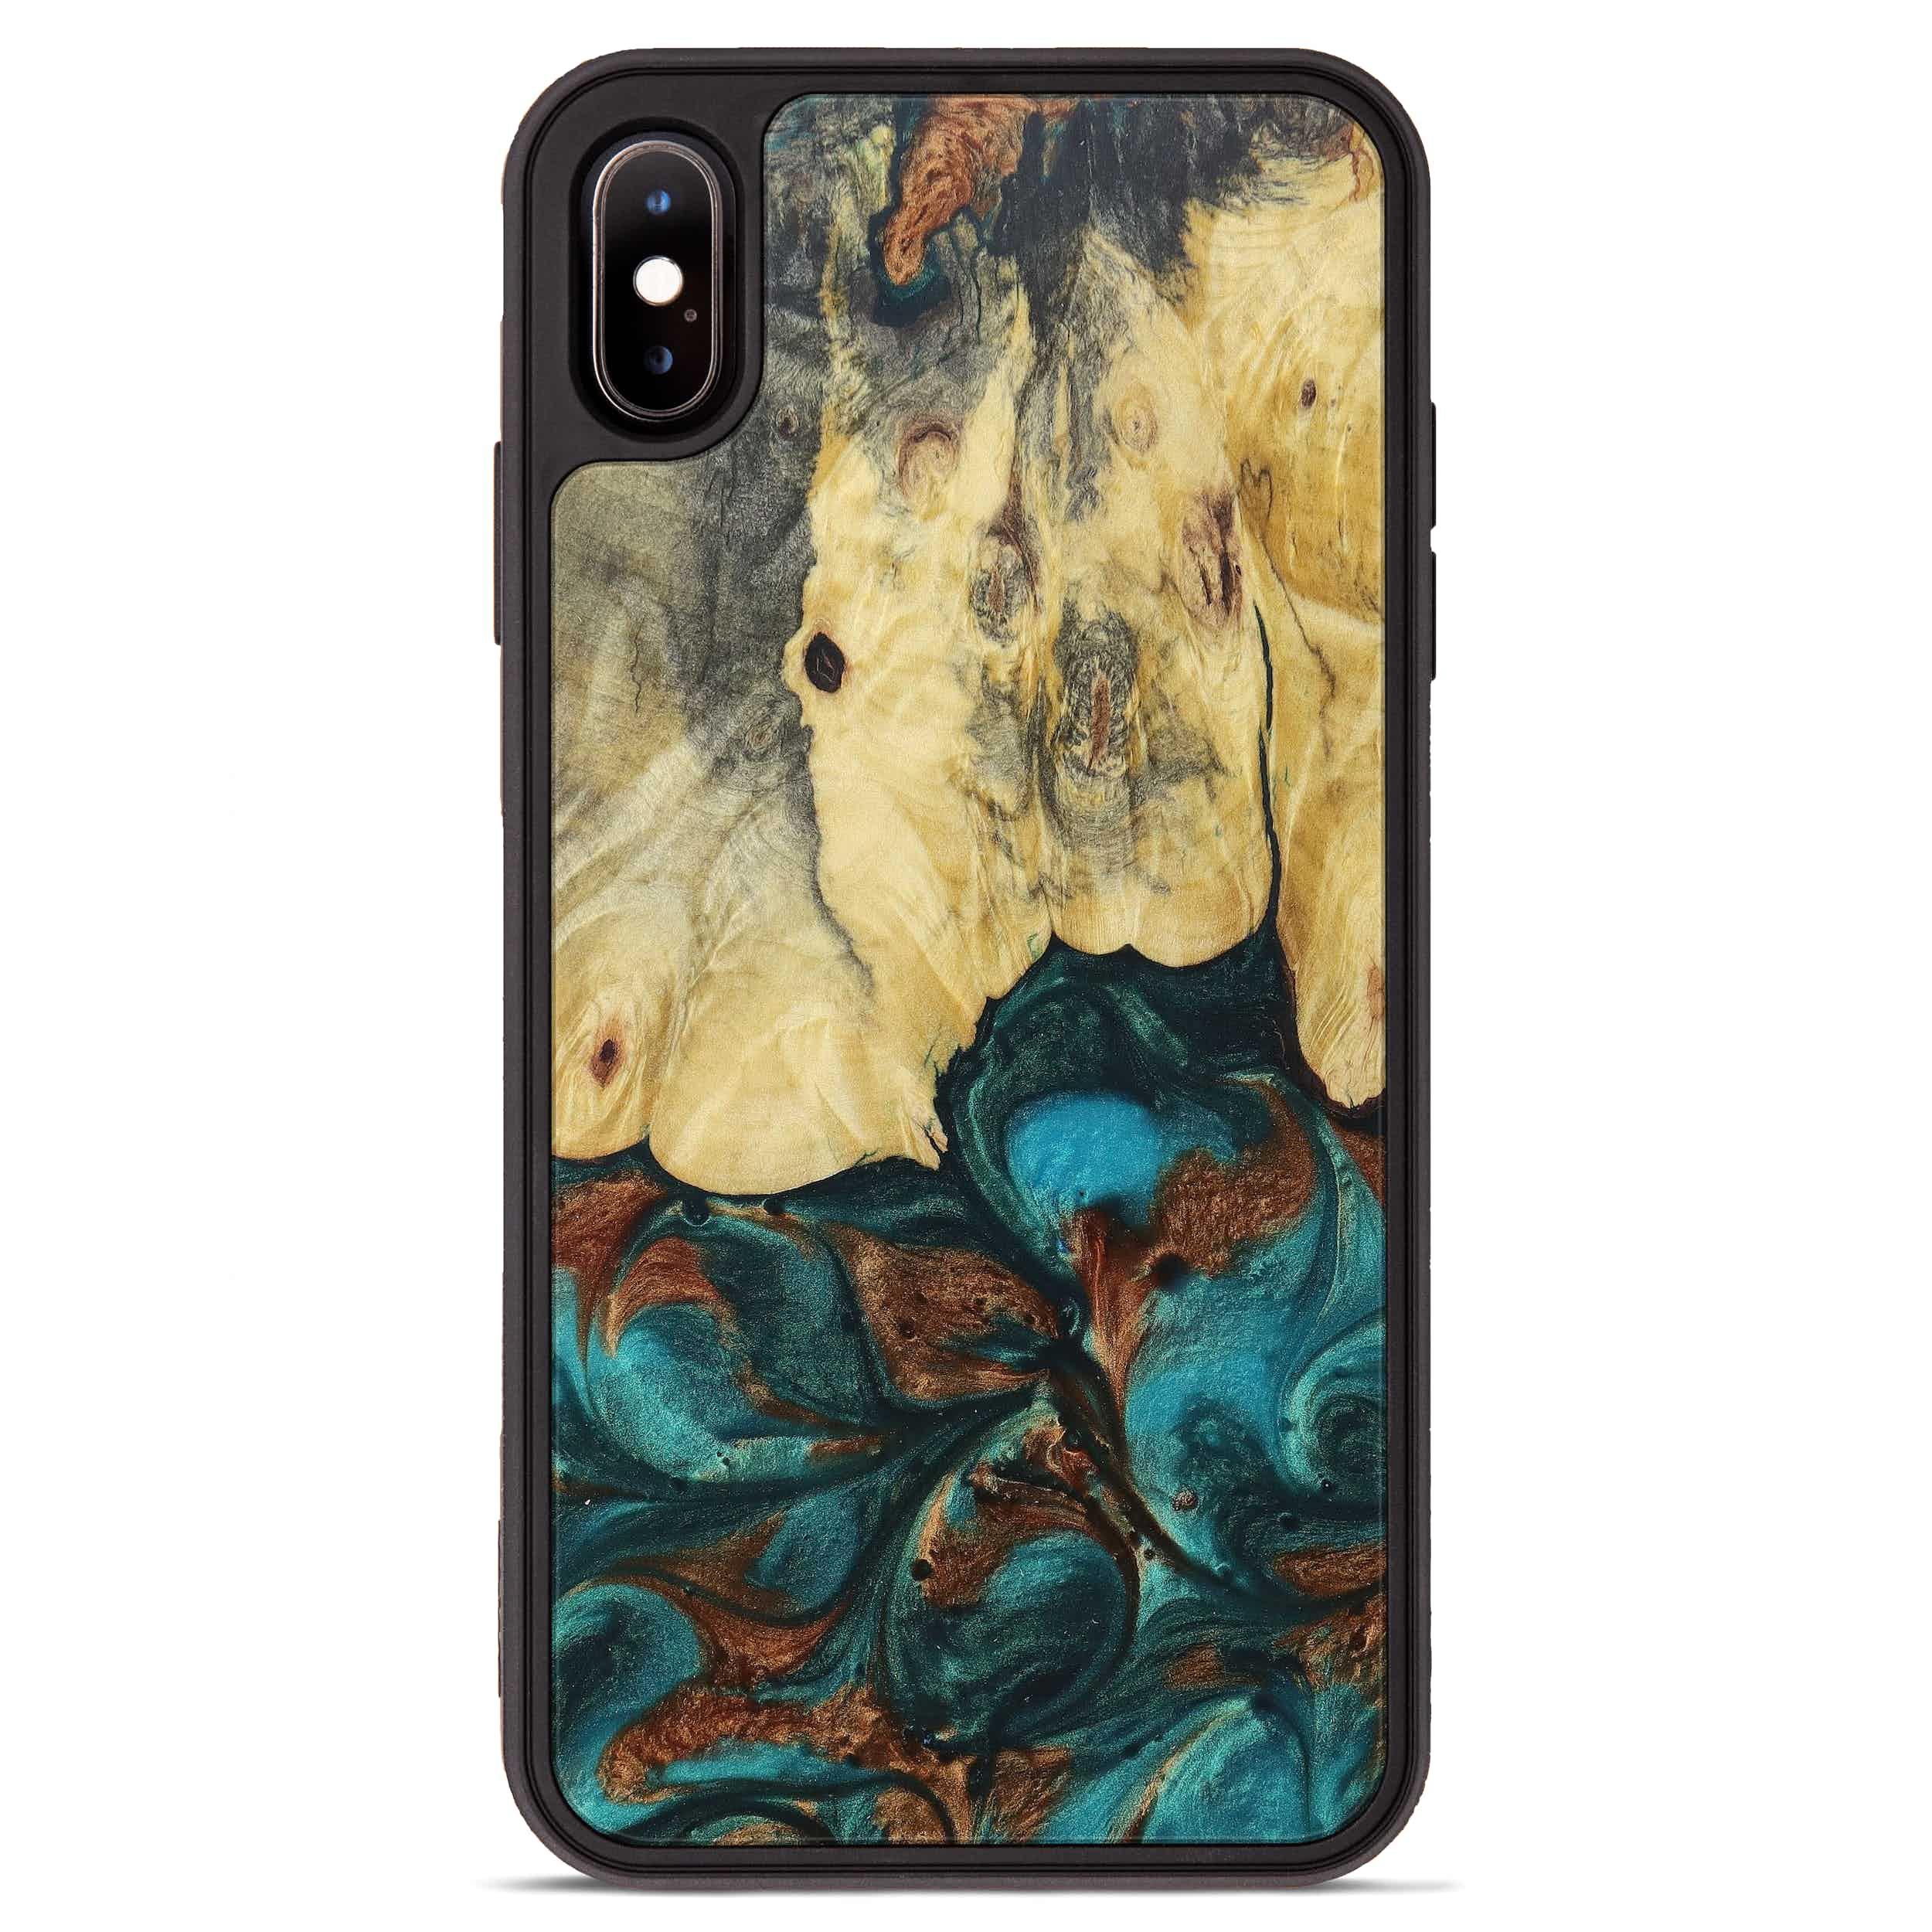 iPhone Xs Max Wood+Resin Phone Case - Karyl (Teal & Gold, 394387)